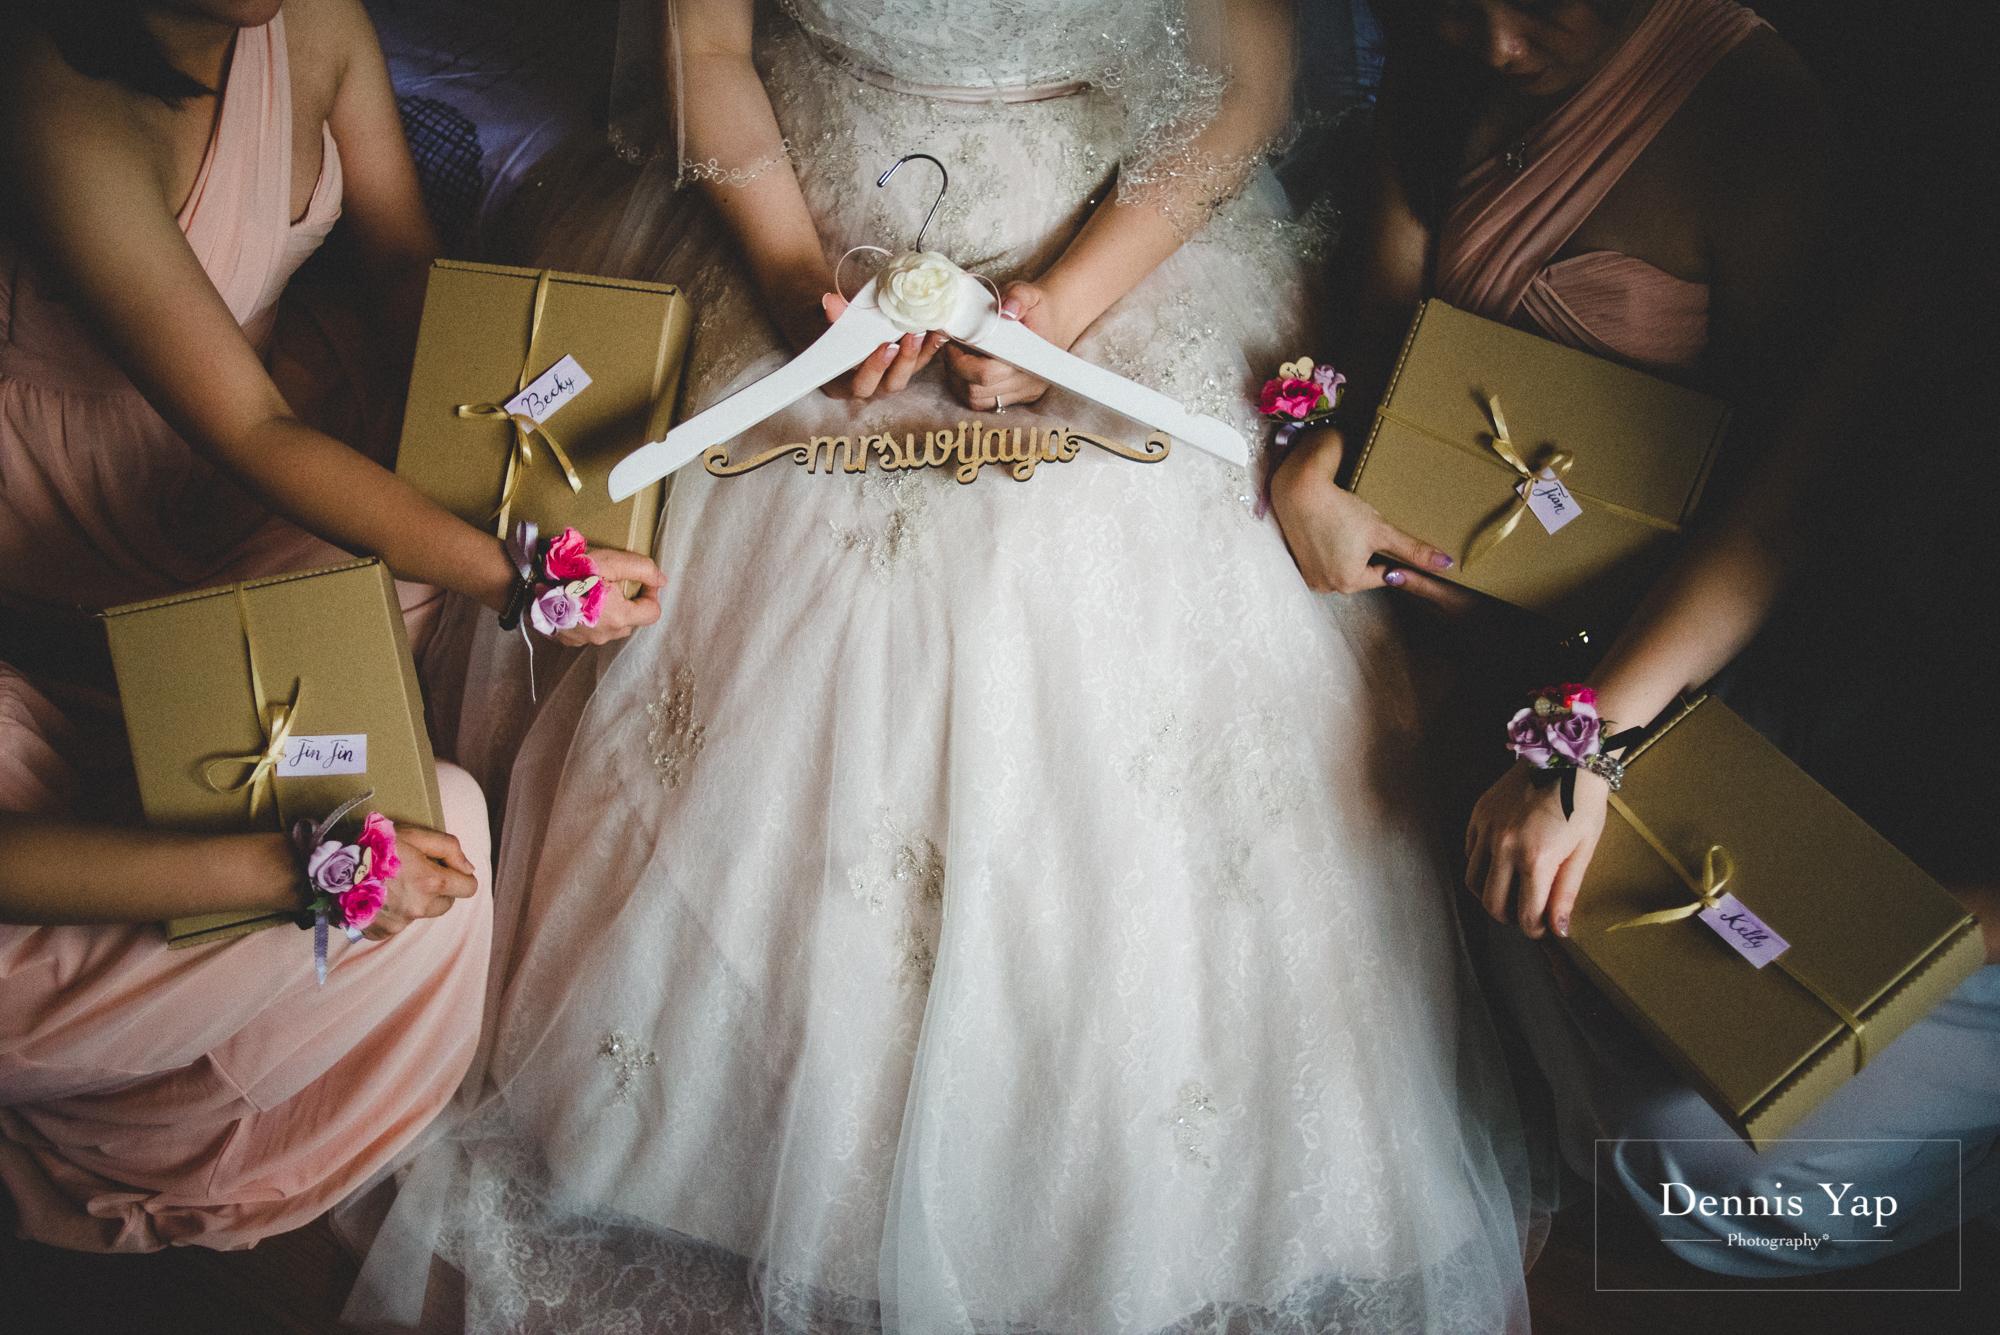 ino sheri black white church wedding st thomas more subang jaya dennis yap photography touching love beloved australia indonesia-4.jpg